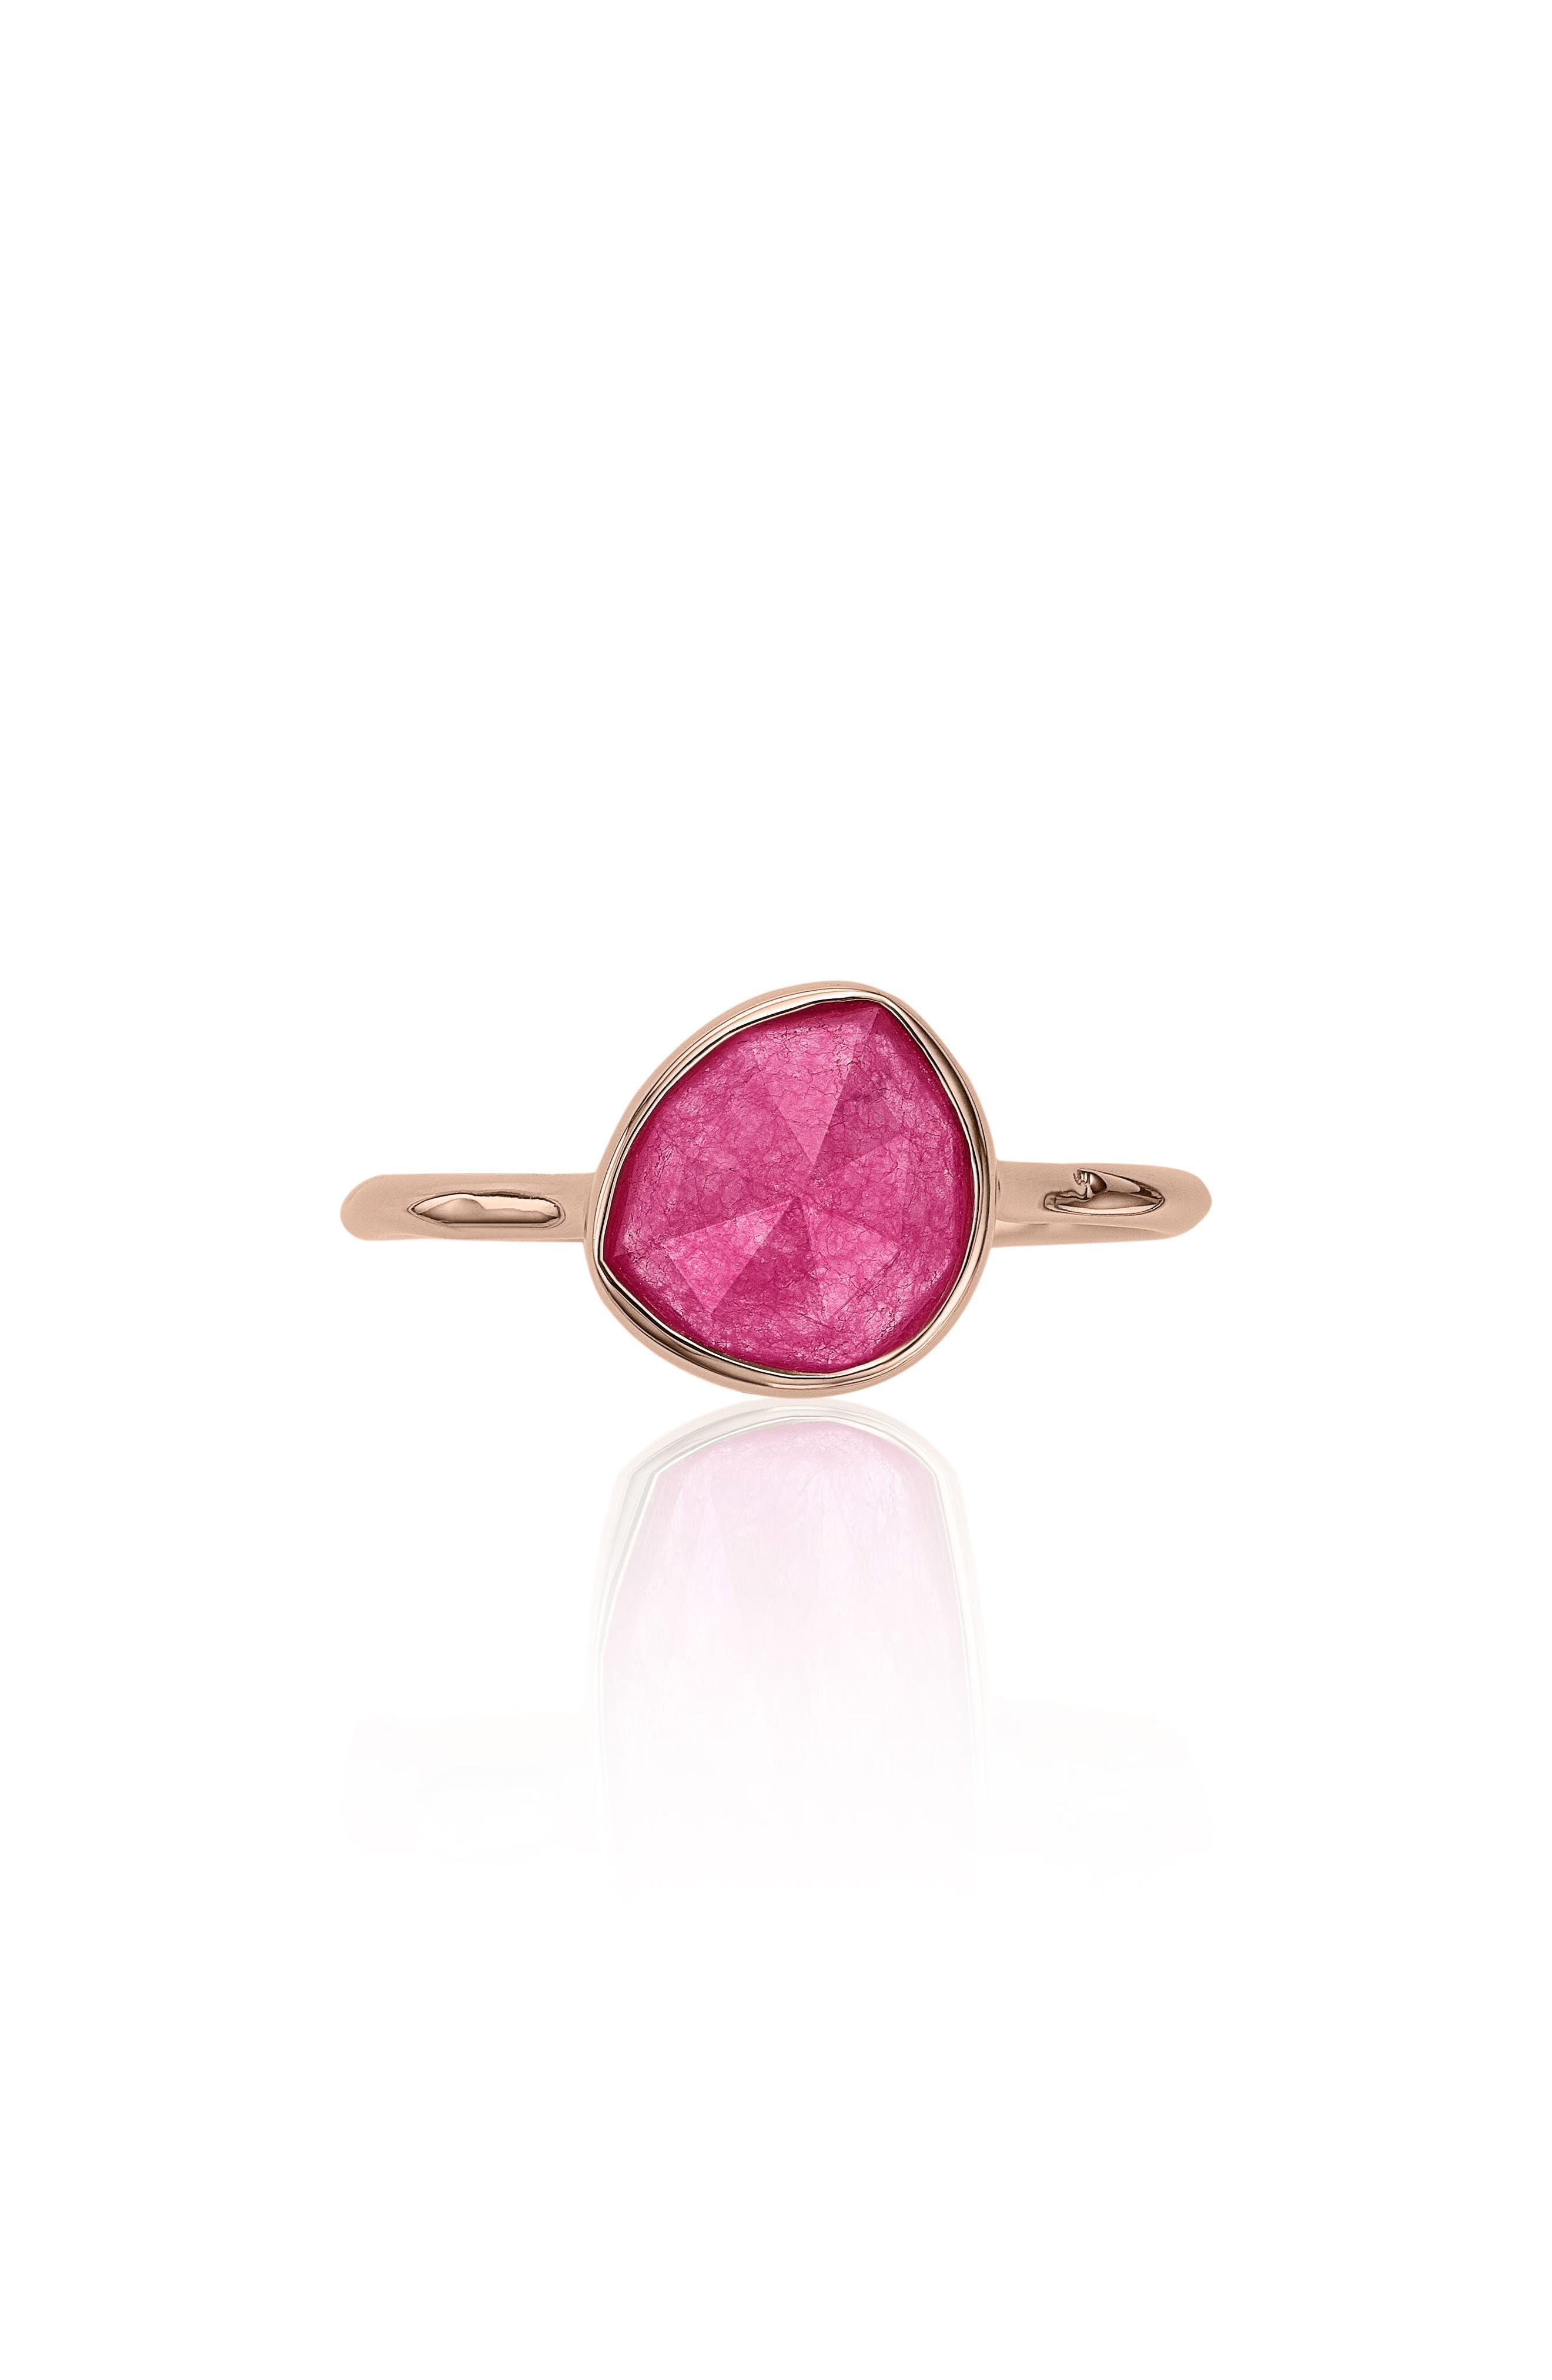 Monica Vinader Siren Semiprecious Stone Stacking Ring